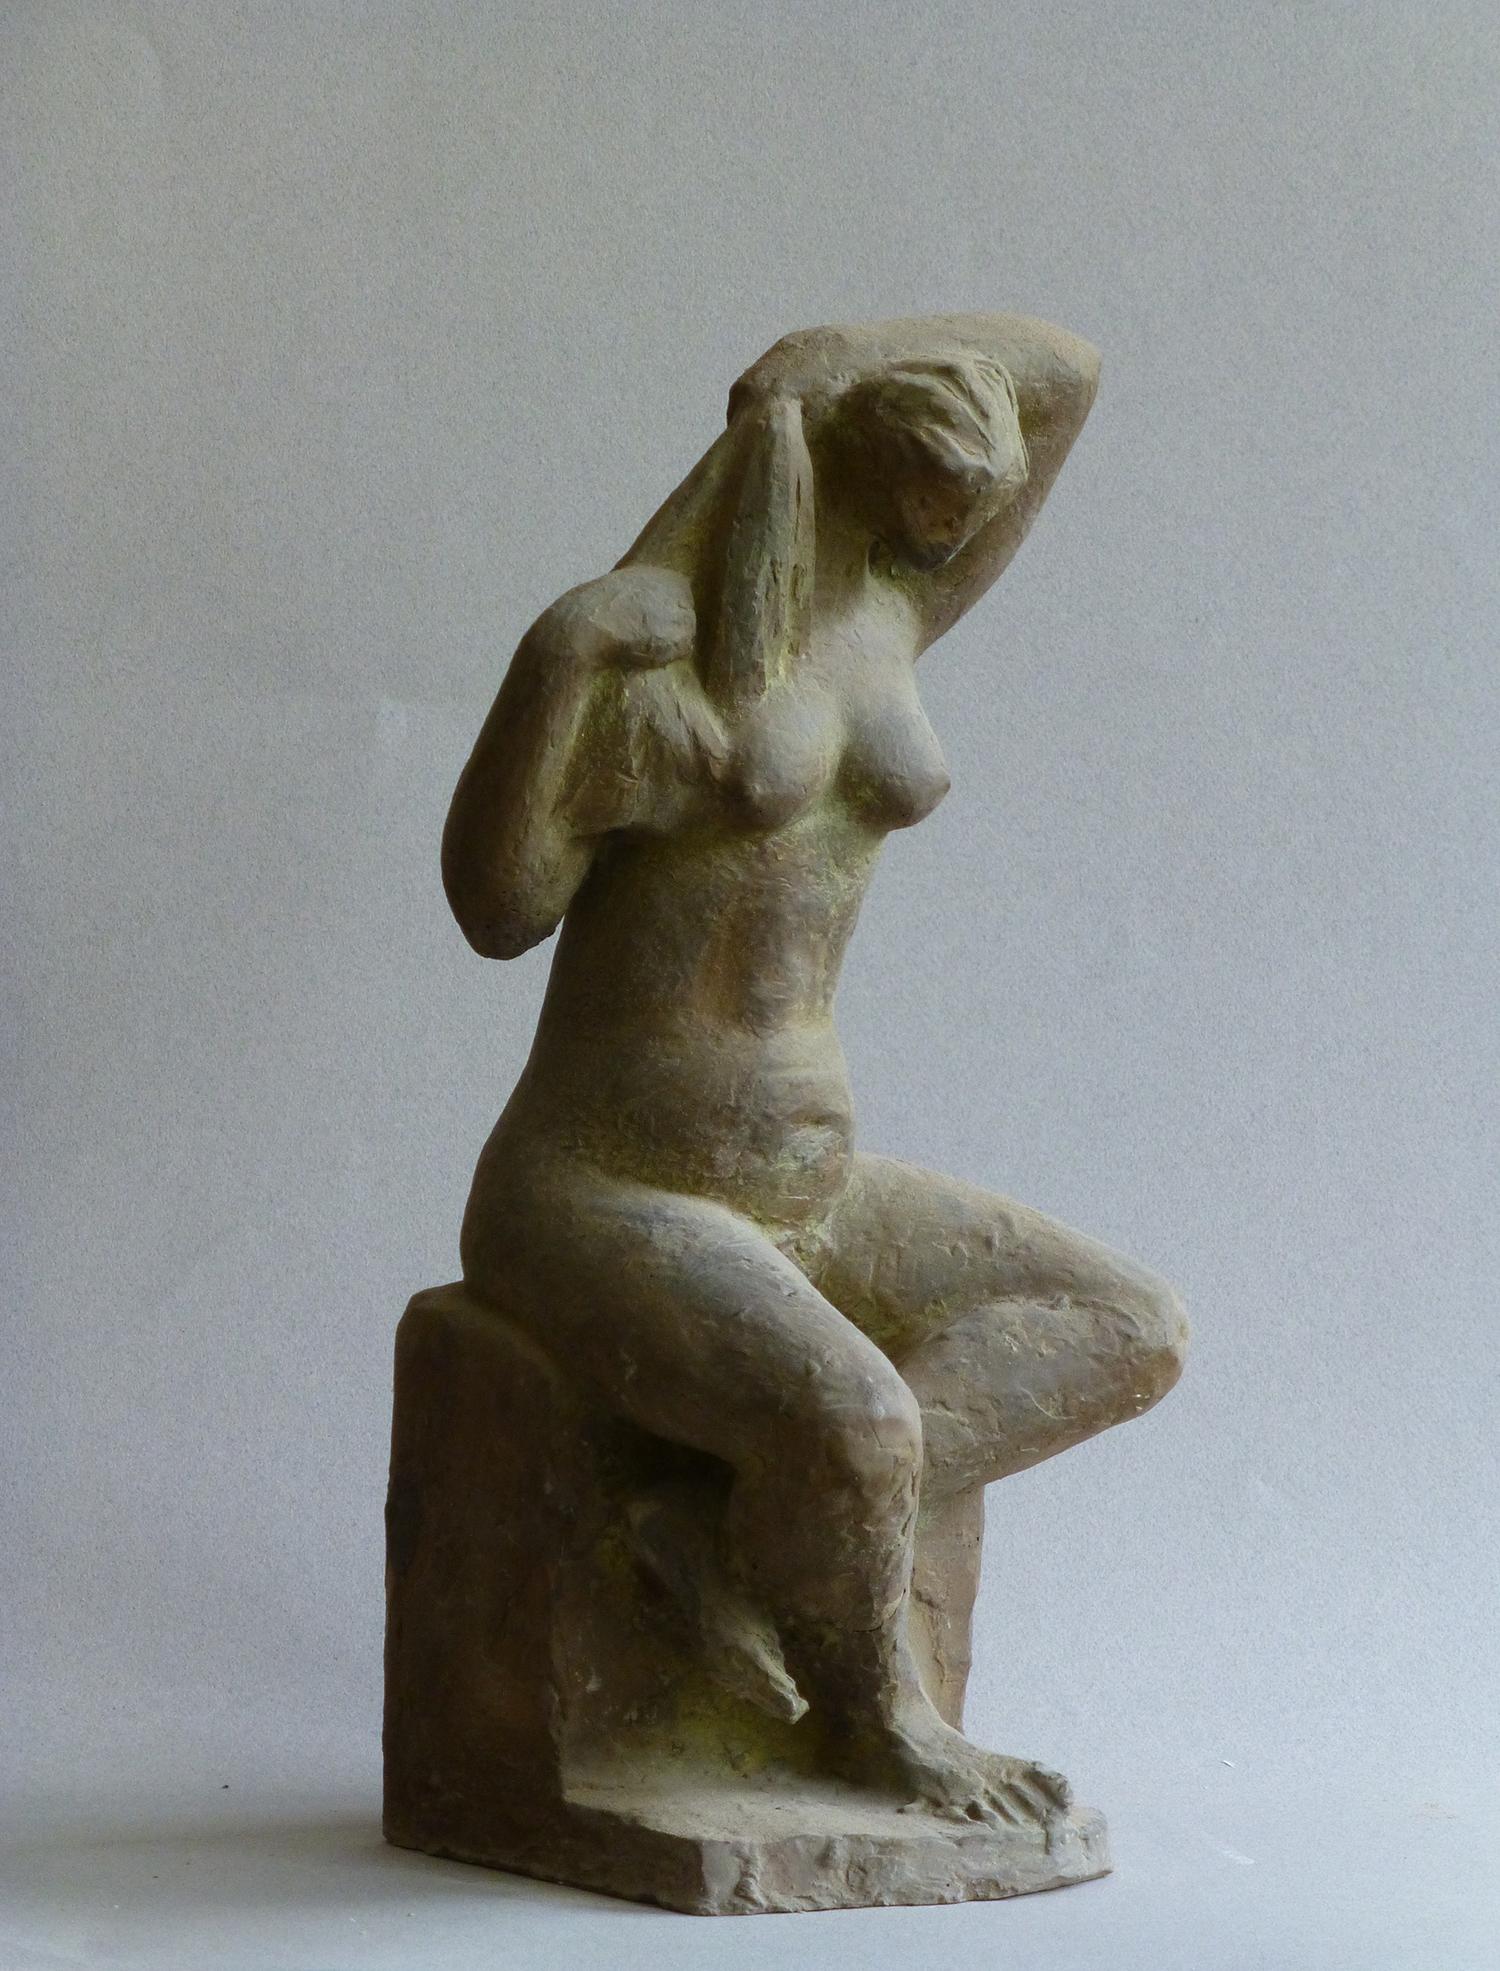 1969.8. Mujer sentada peinándose, hormigón, 34,5x13,5x15 cms. 1969